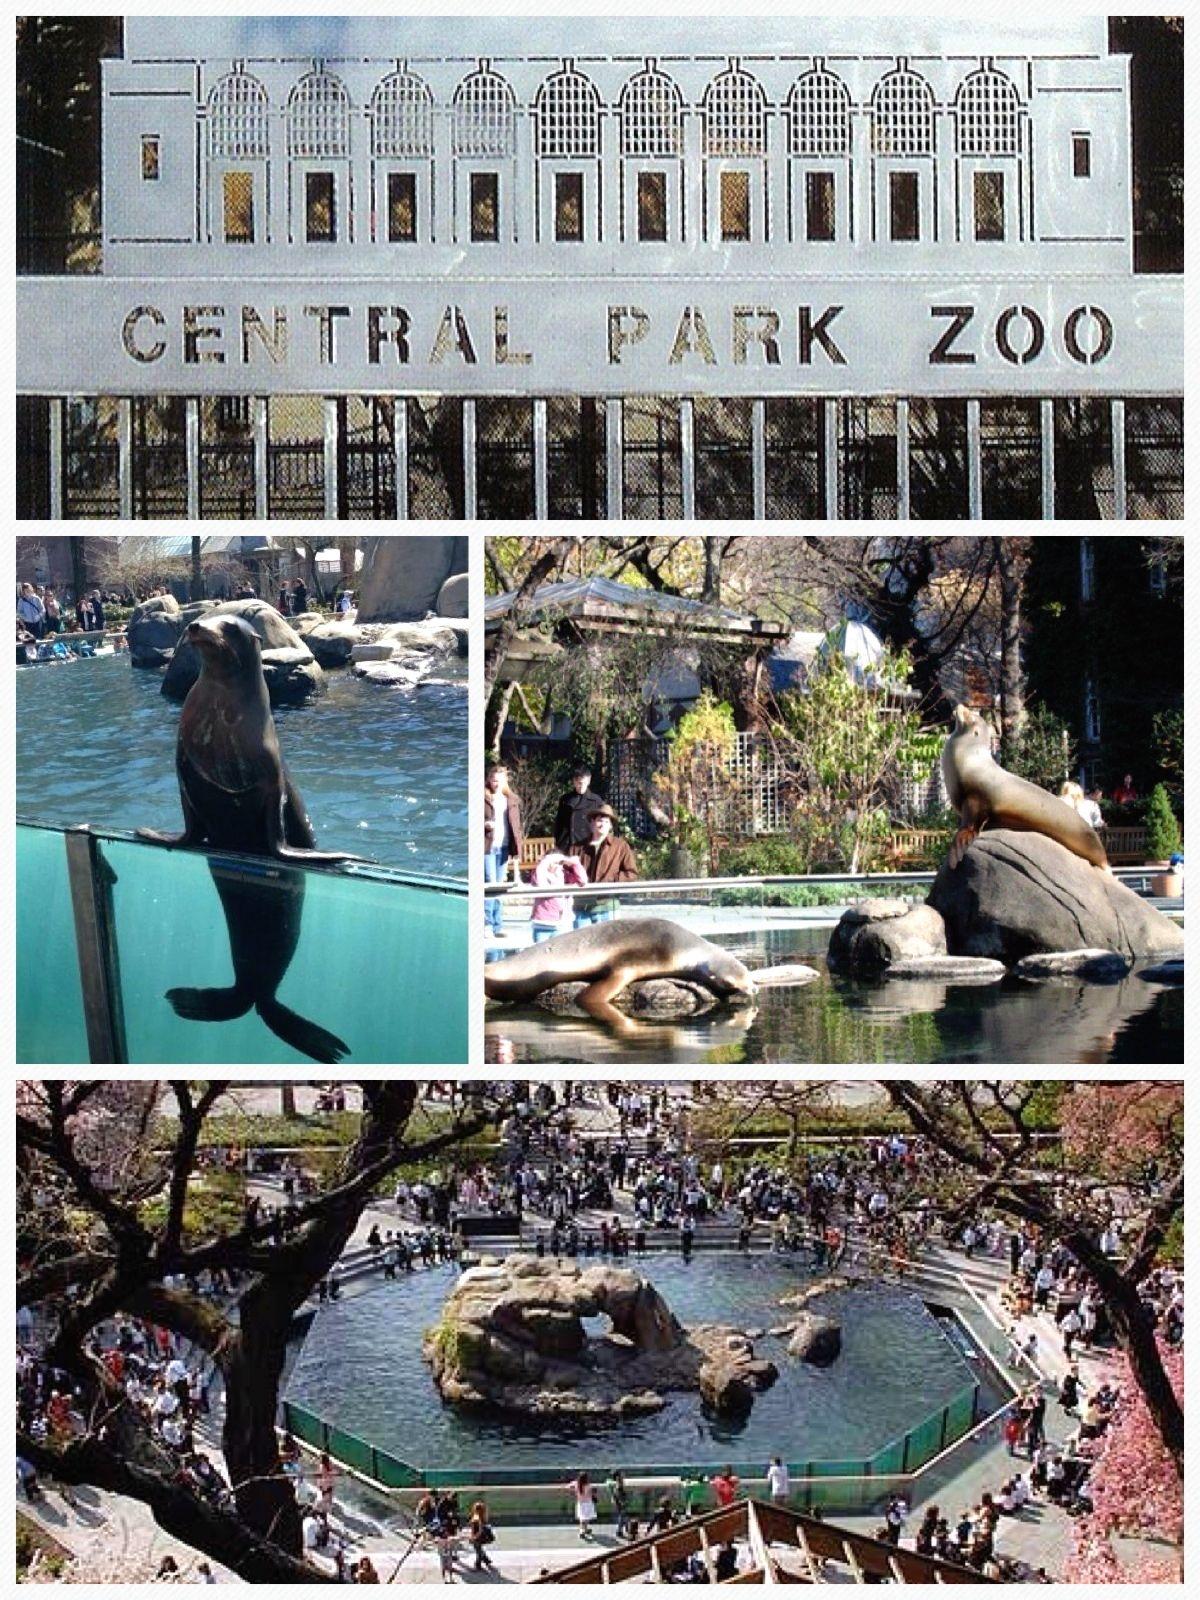 Central Park Zoo Central Park Nyc New York City Central Park